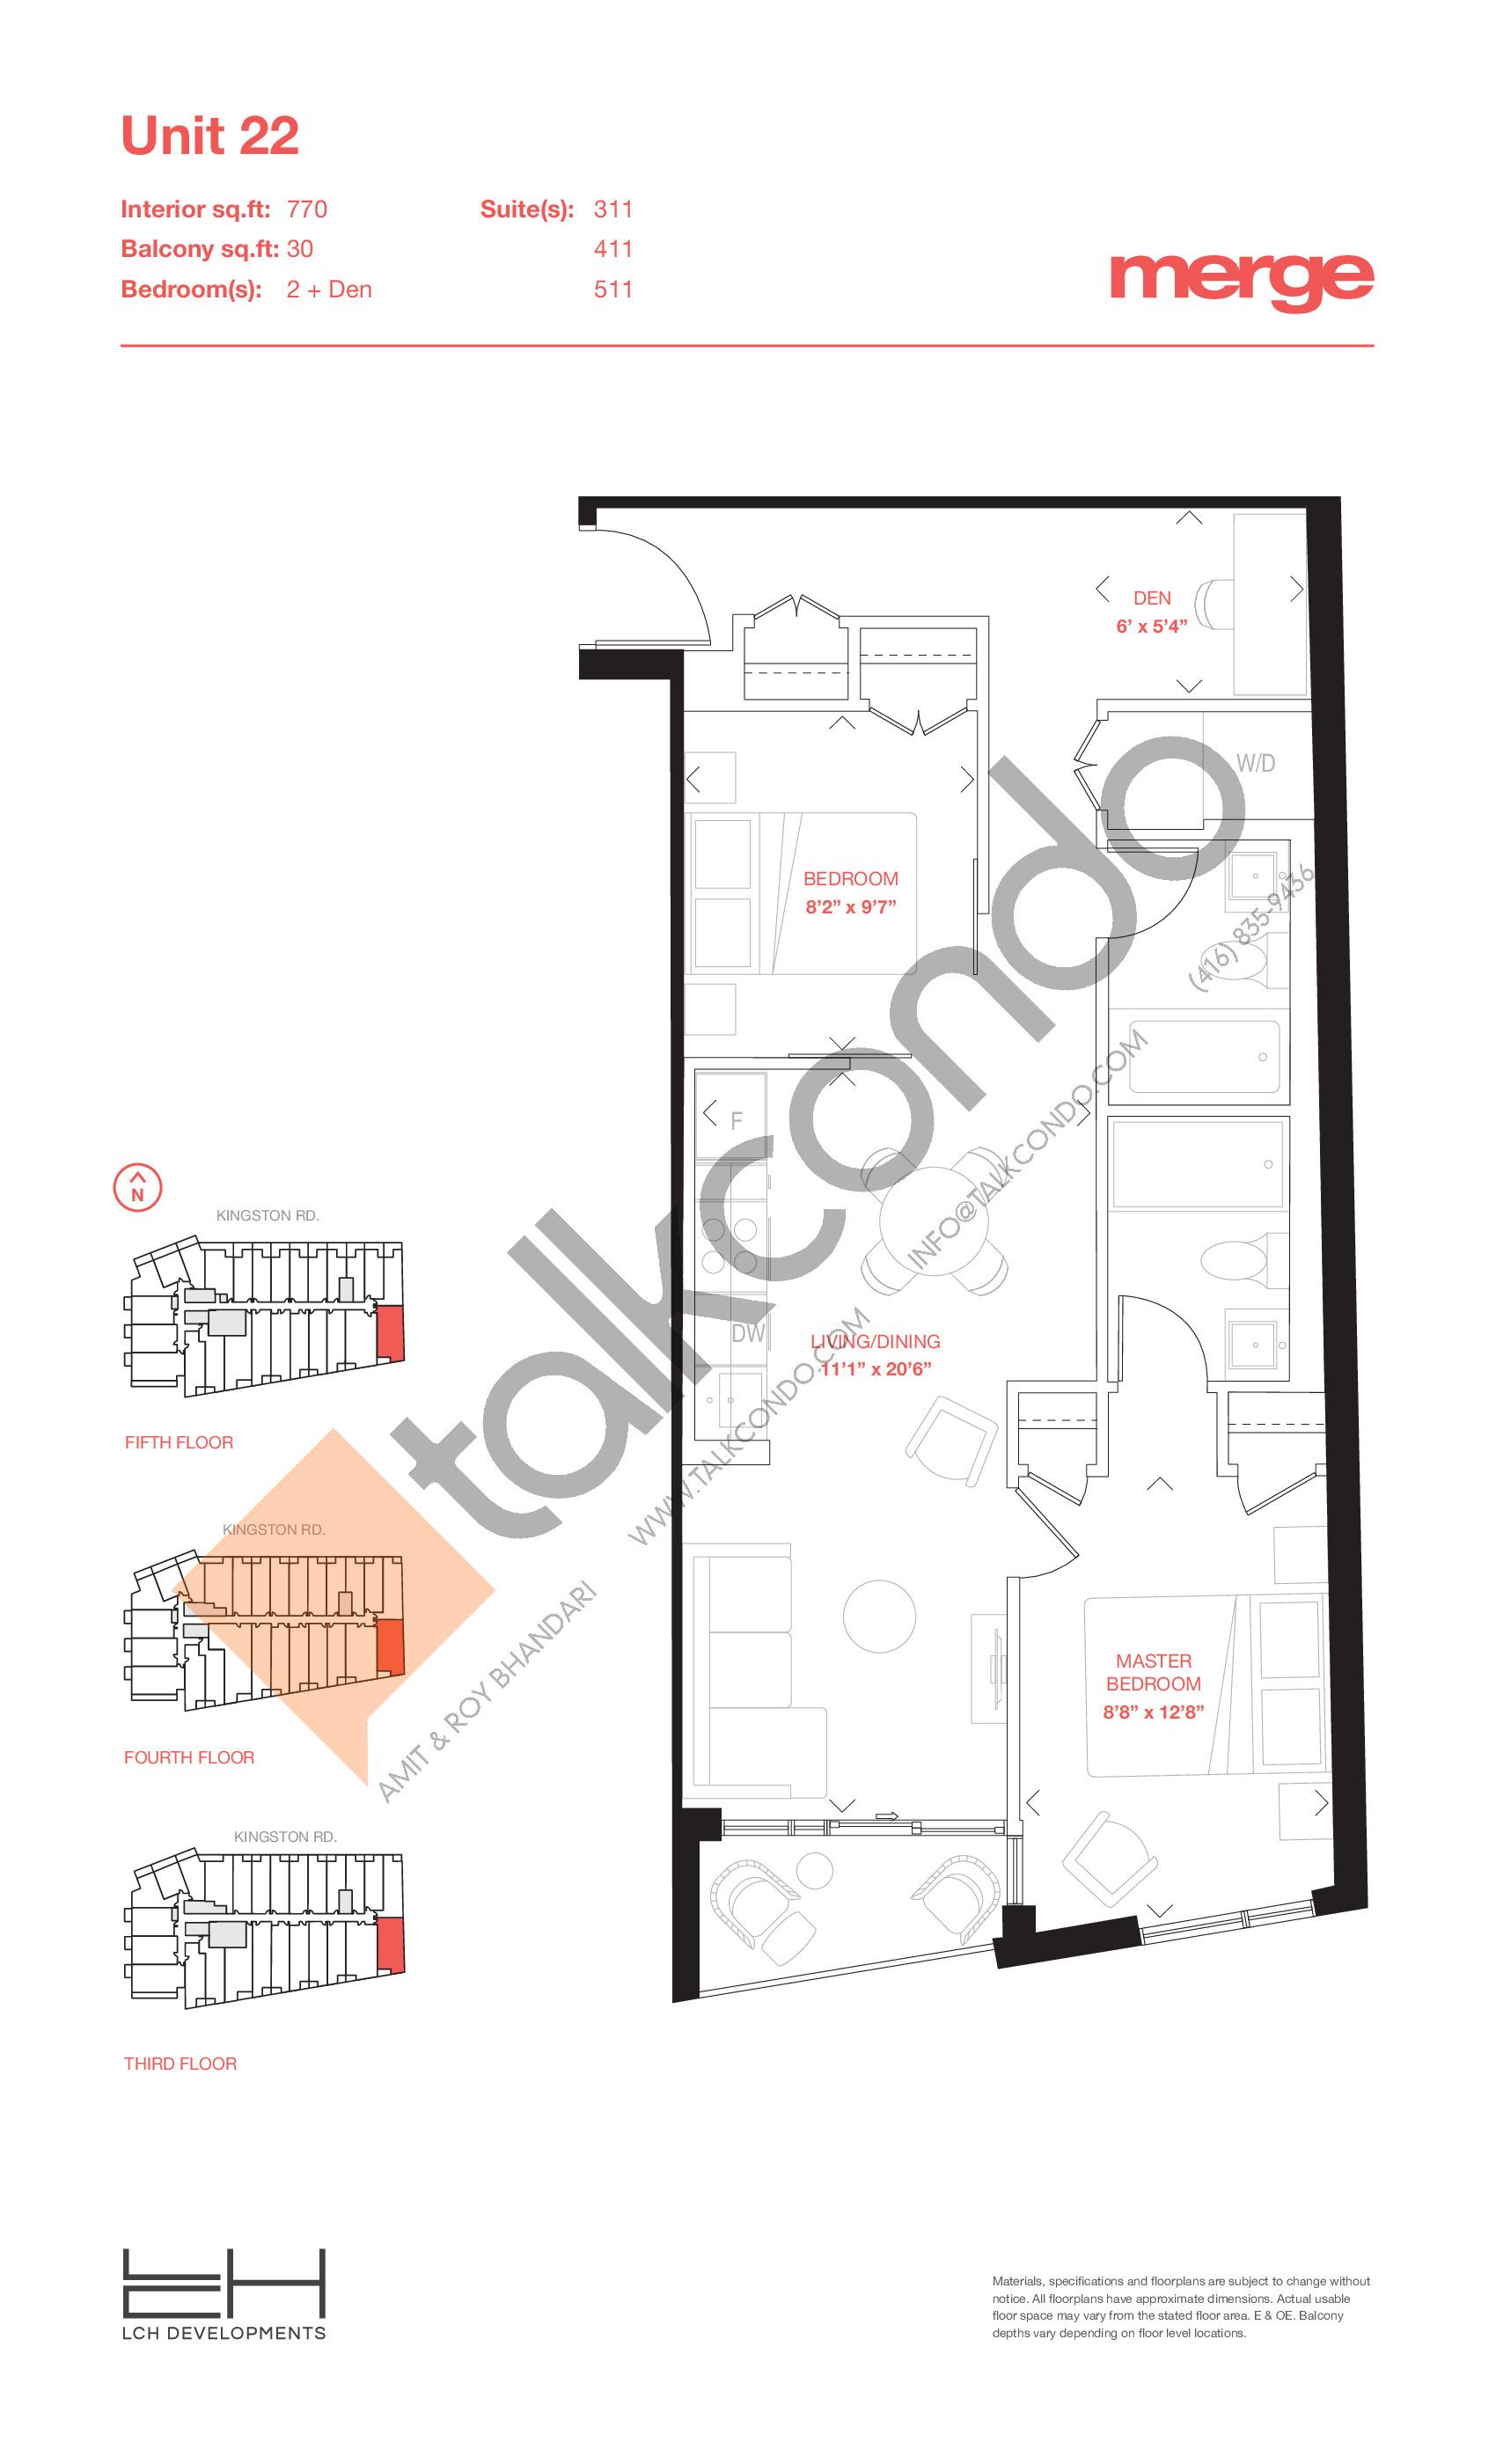 Unit 22 - Tower Floor Plan at Merge Condos - 770 sq.ft